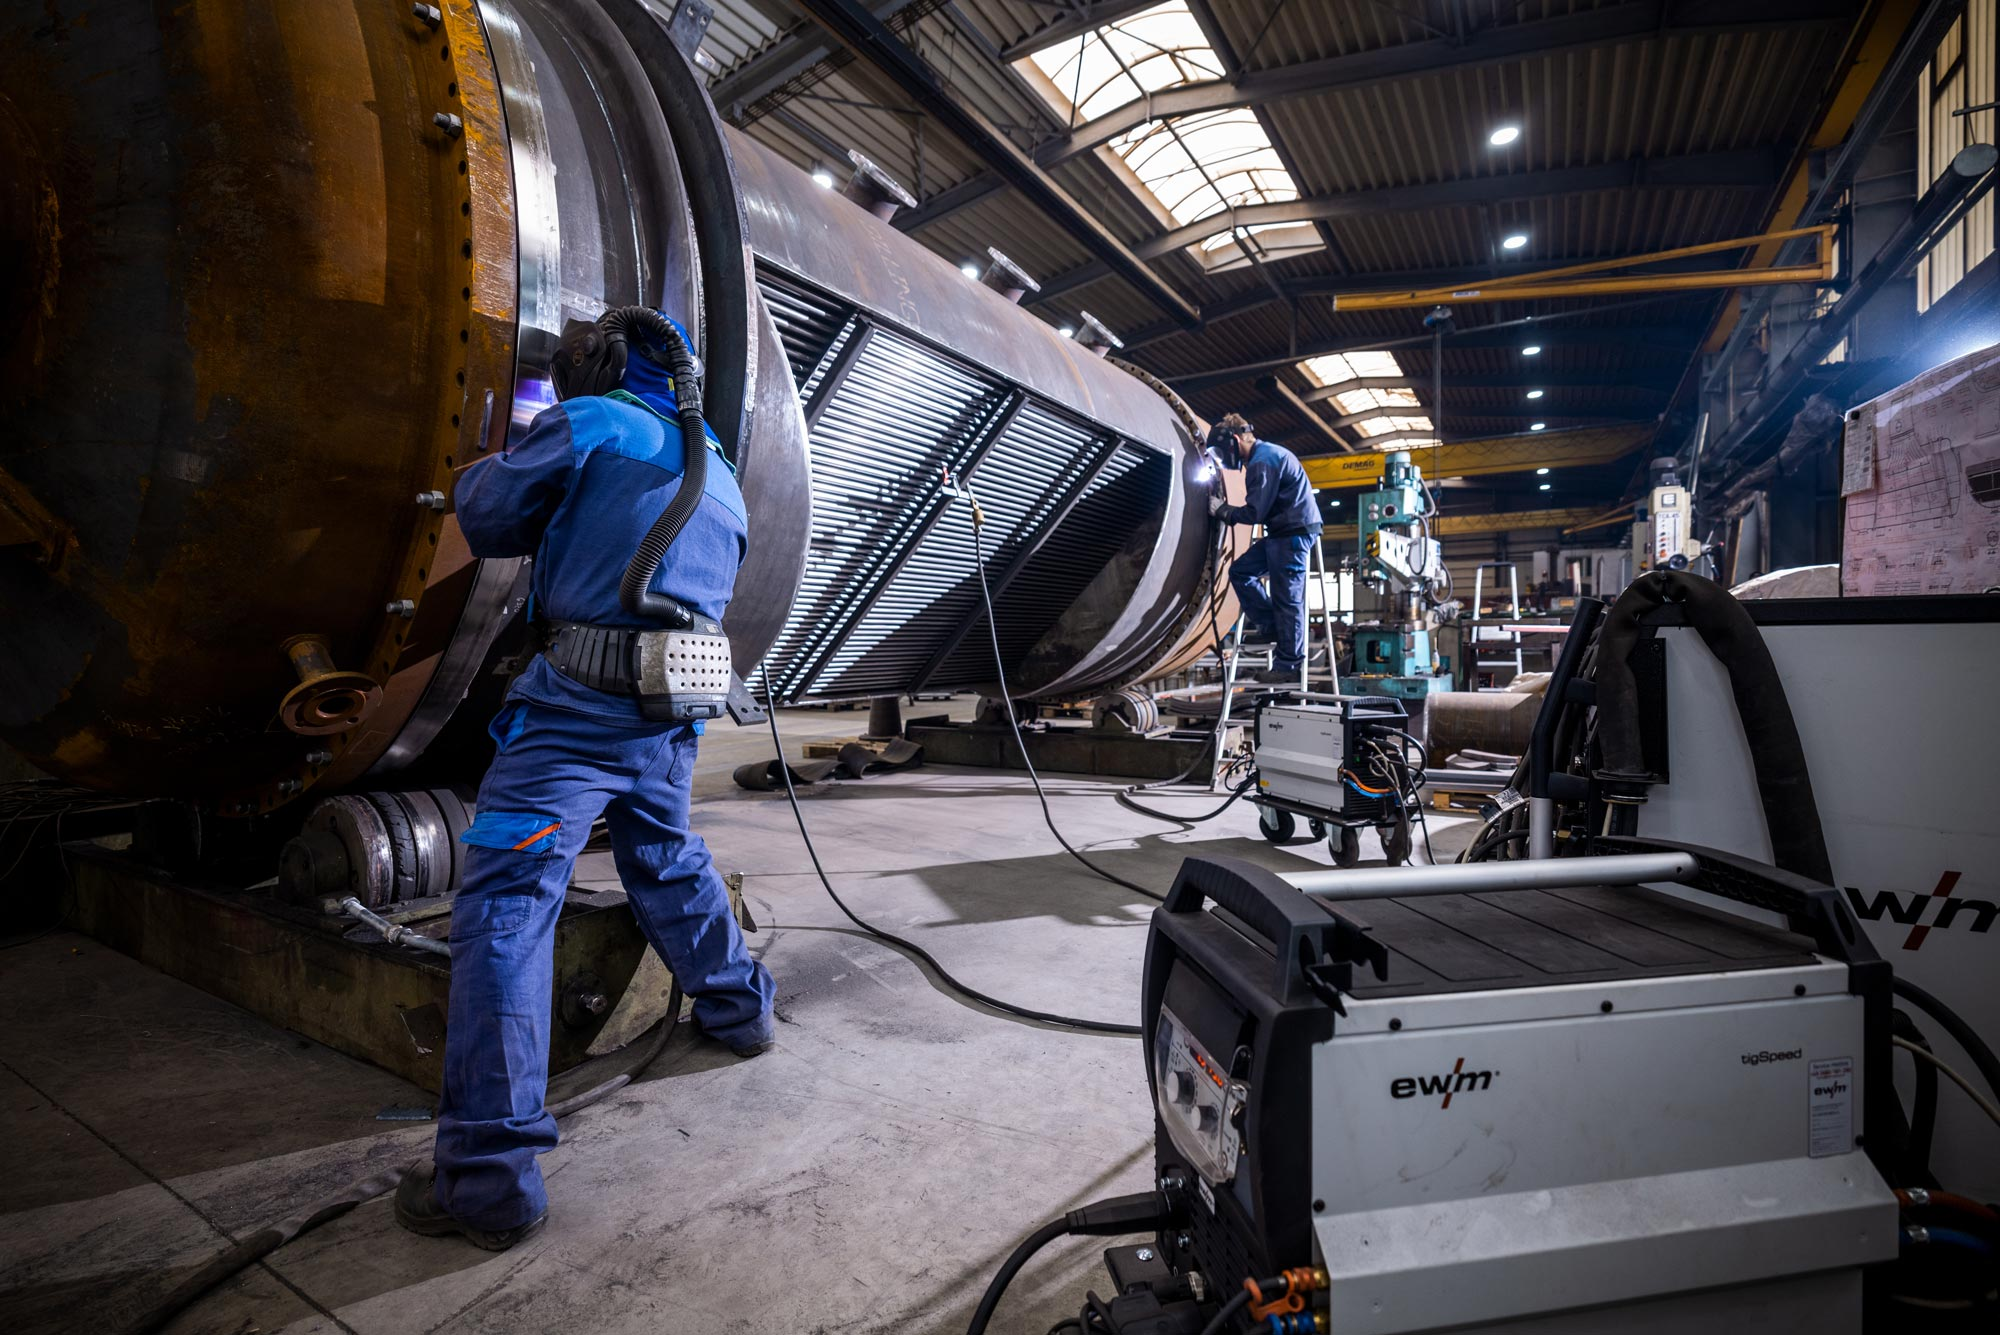 Gebrüder Stahl GmbH